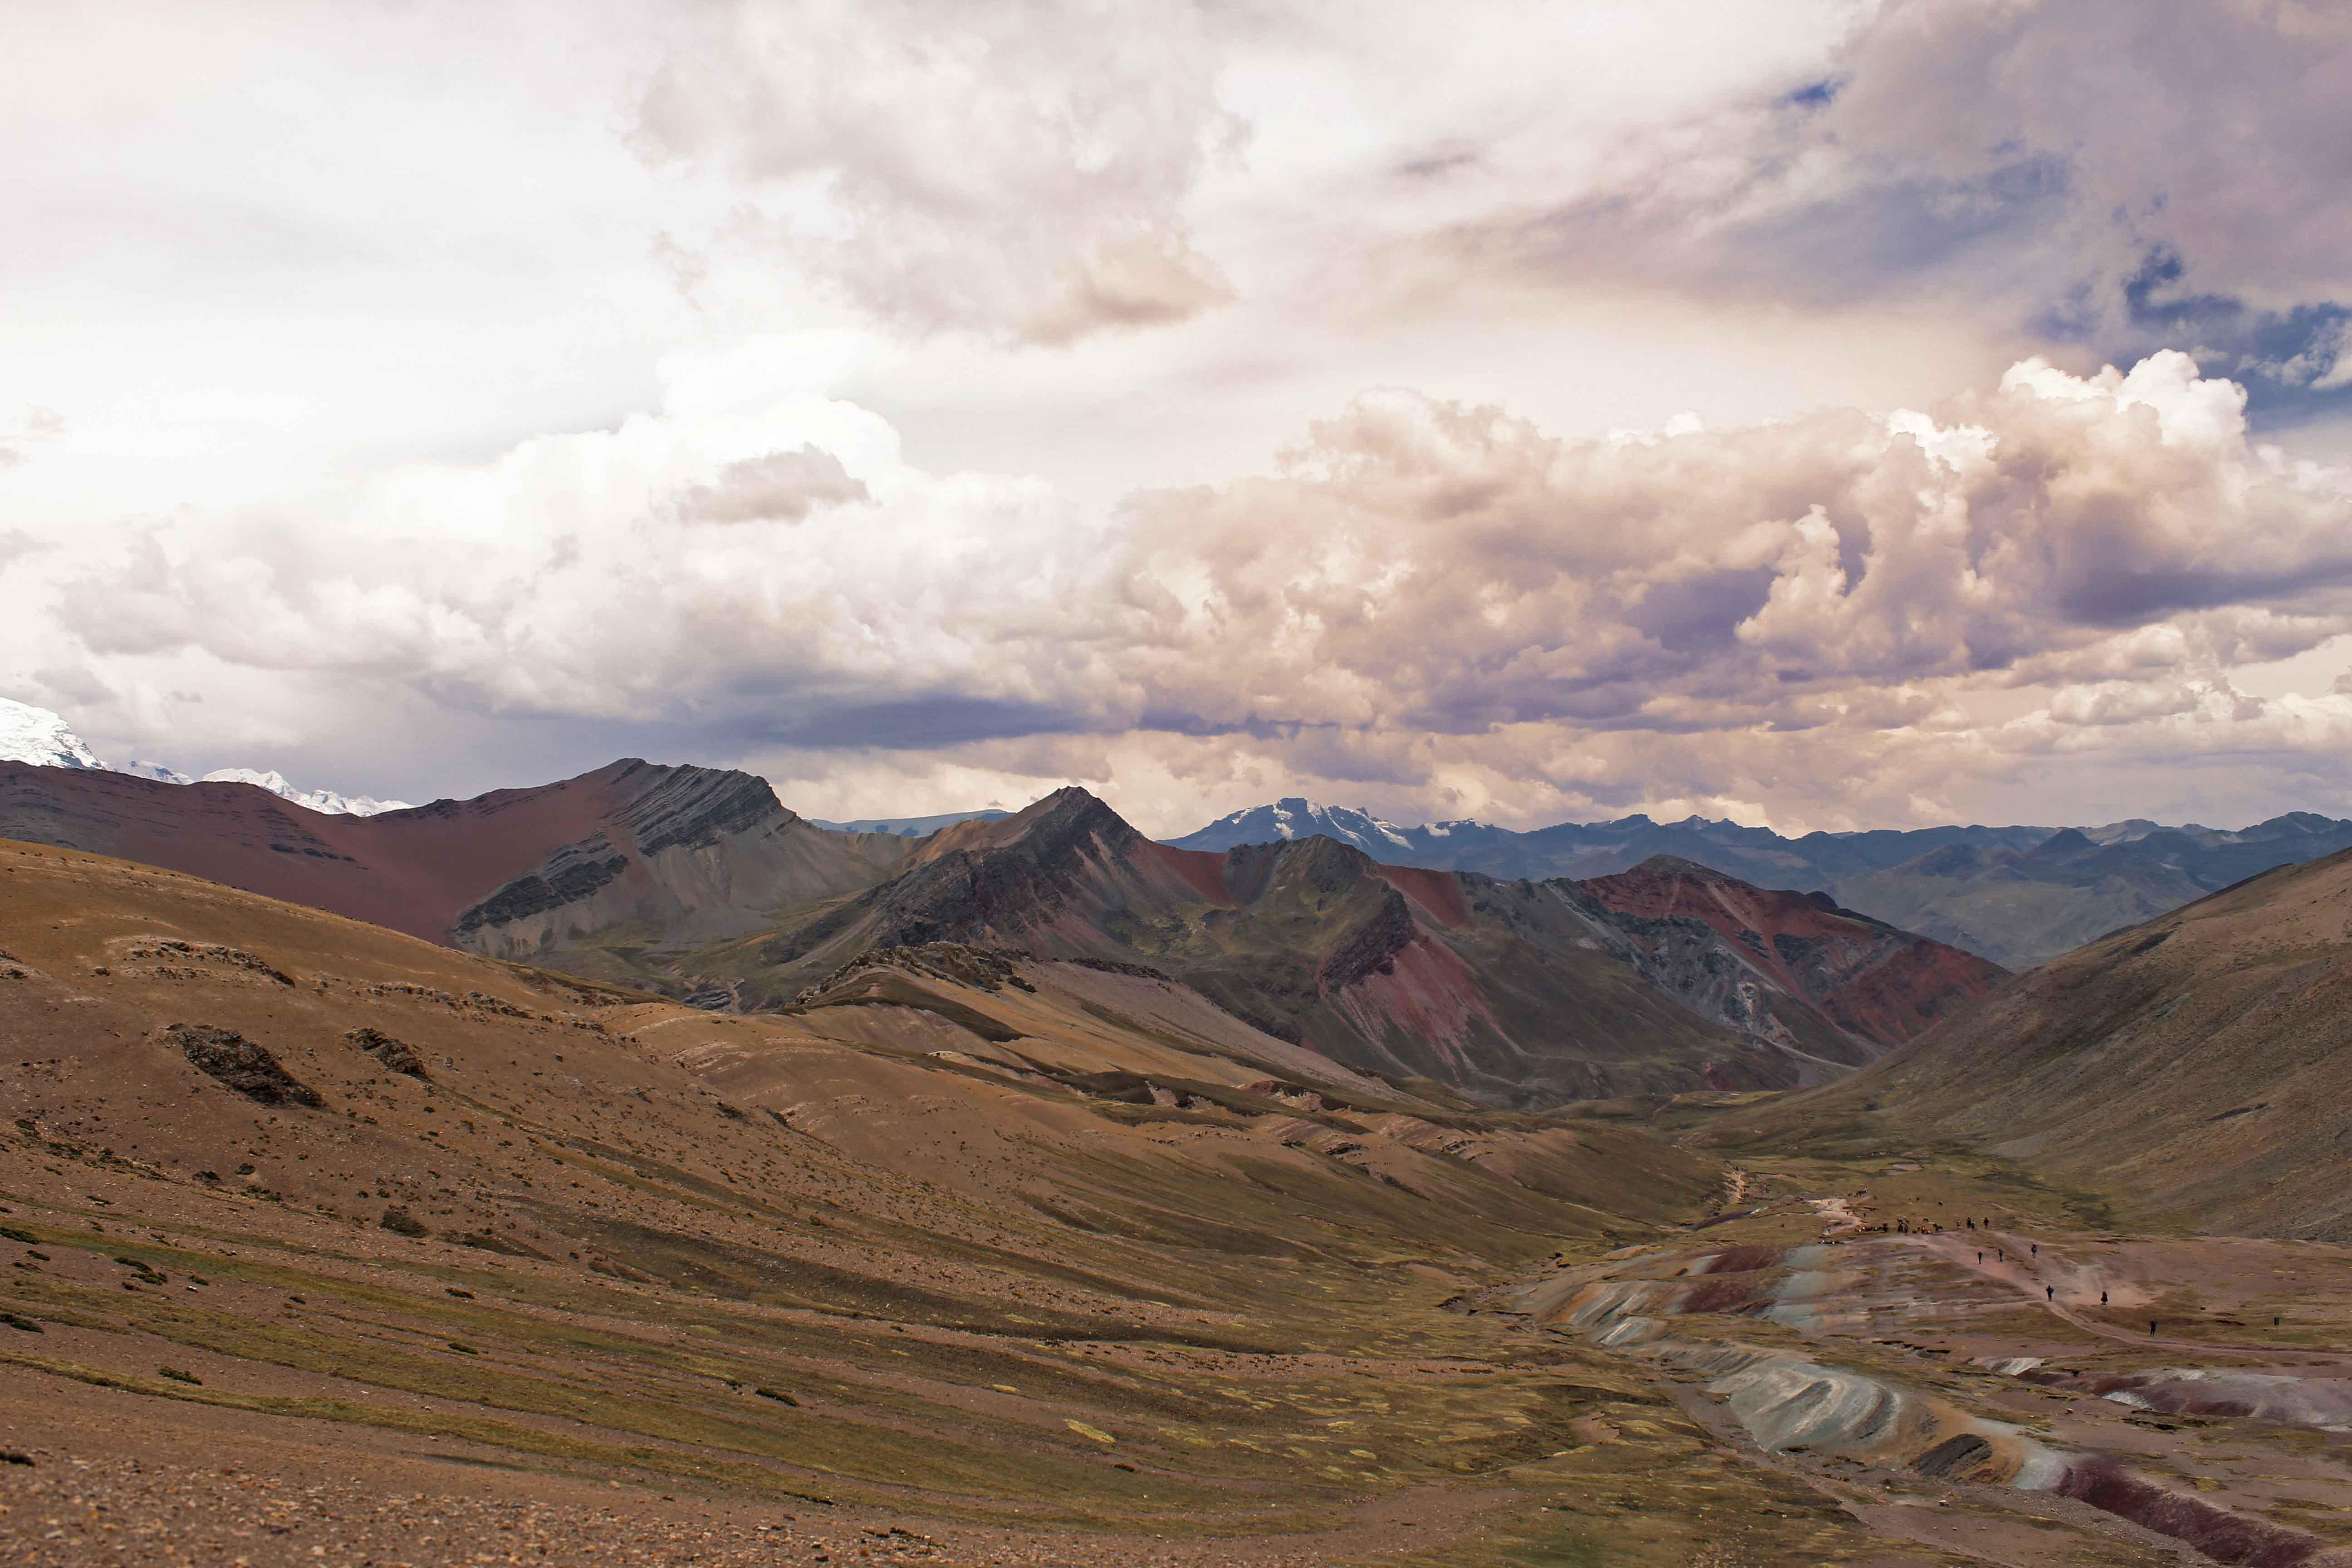 Peru_ Cesta na dúhovú horu Vinicuncu Rainbow Mountain